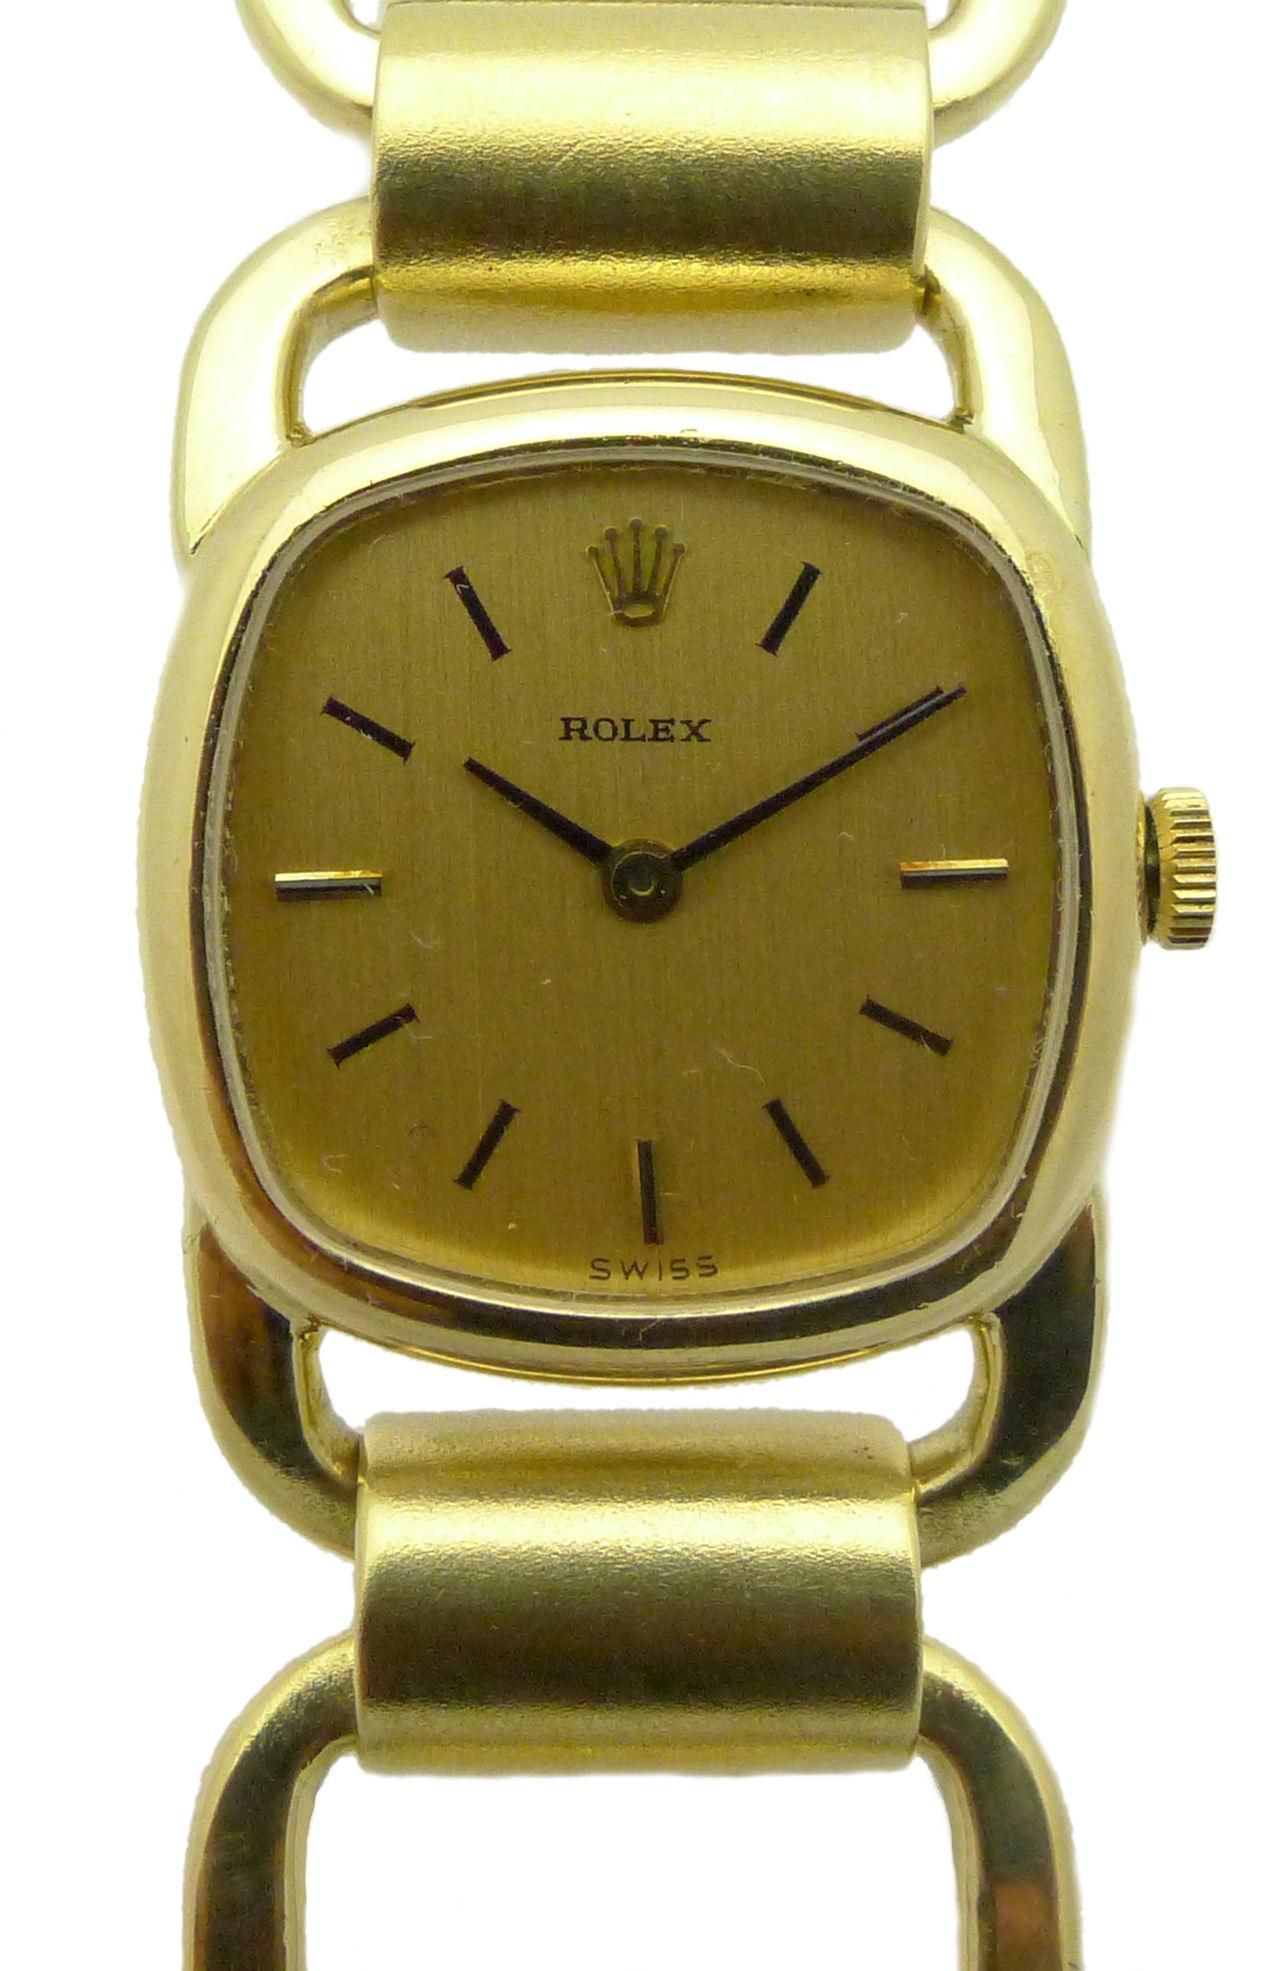 rolex designer armbanduhr aus den 1970er jahren massiv 18ct gold damen ebay. Black Bedroom Furniture Sets. Home Design Ideas